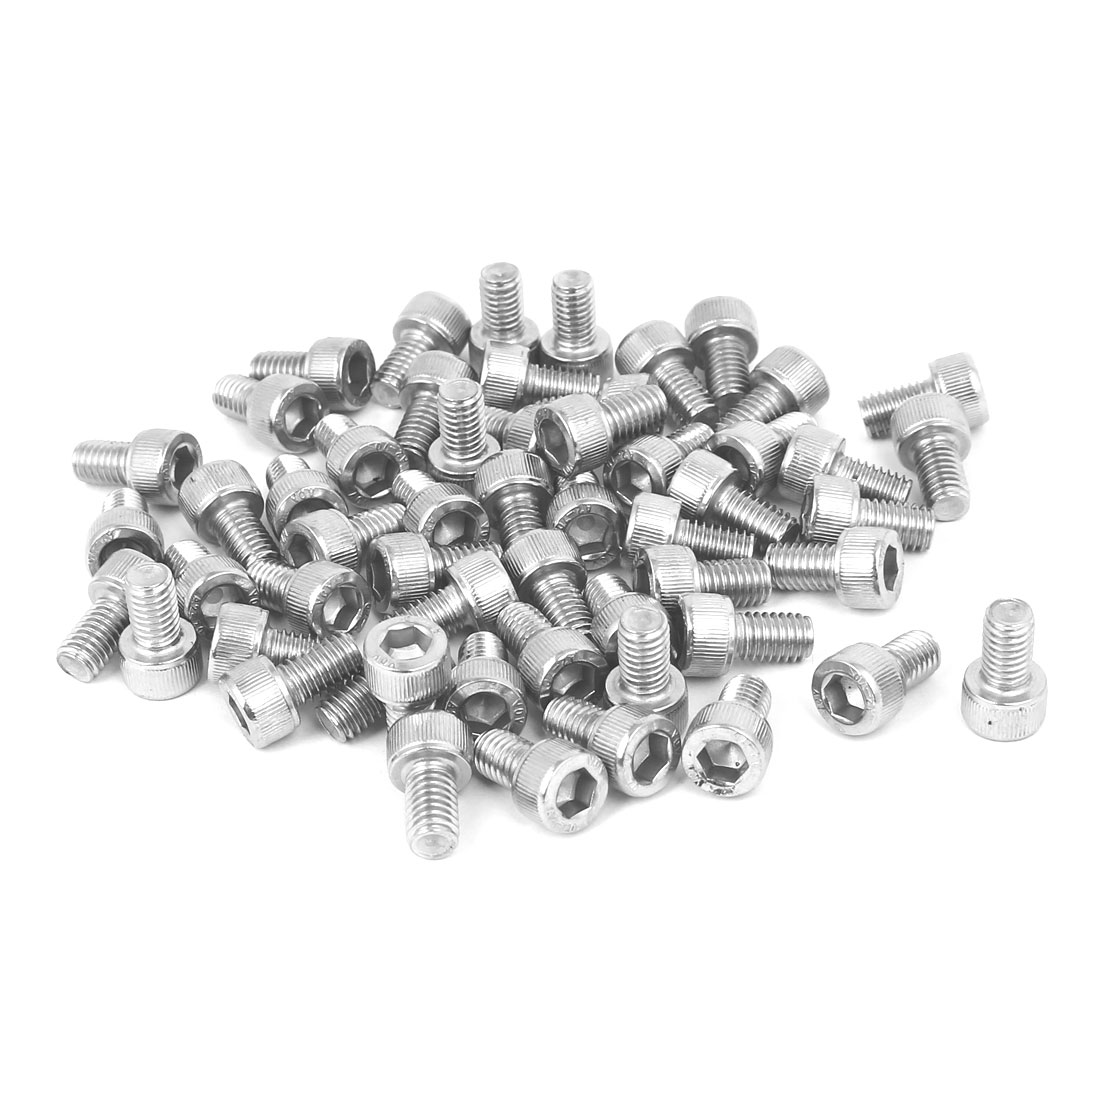 M6 x 10mm Thread 304 Stainless Steel Hex Socket Head Cap Screw Bolt DIN912 55pcs